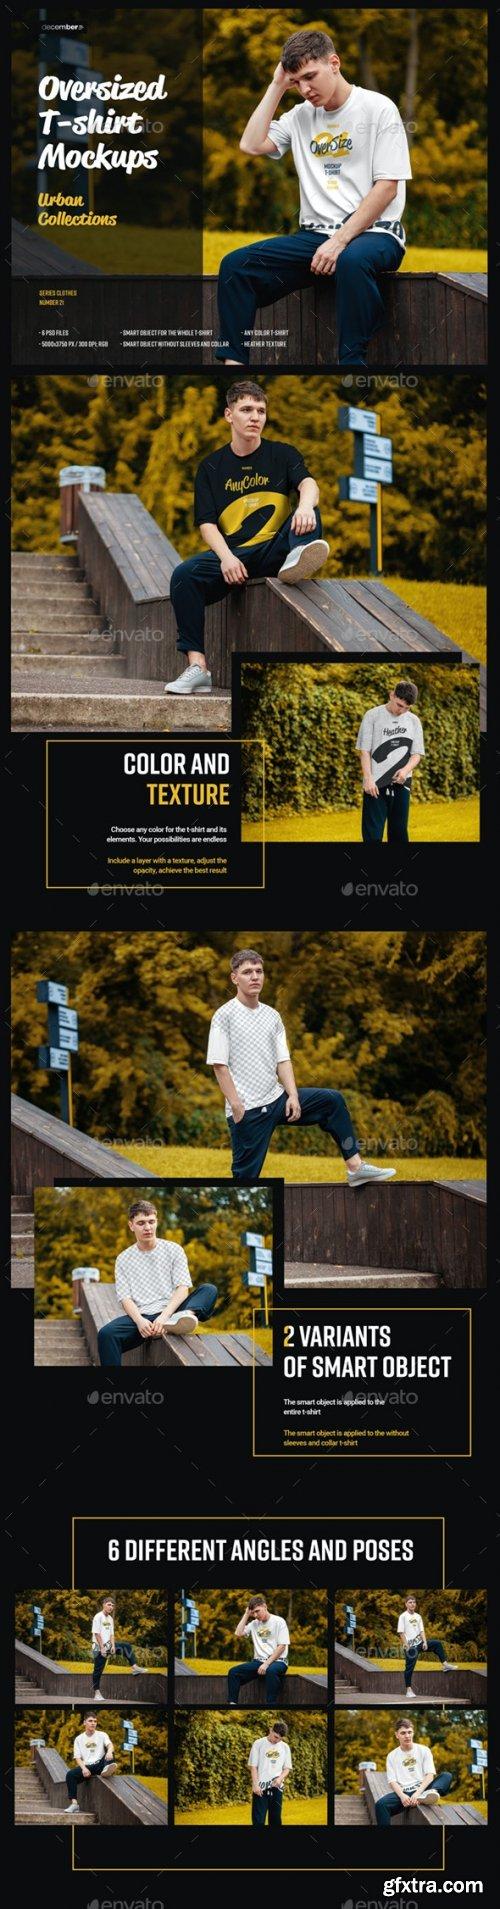 GraphicRiver - 6 Oversized T-shirt Mockup Urban Style 28713242